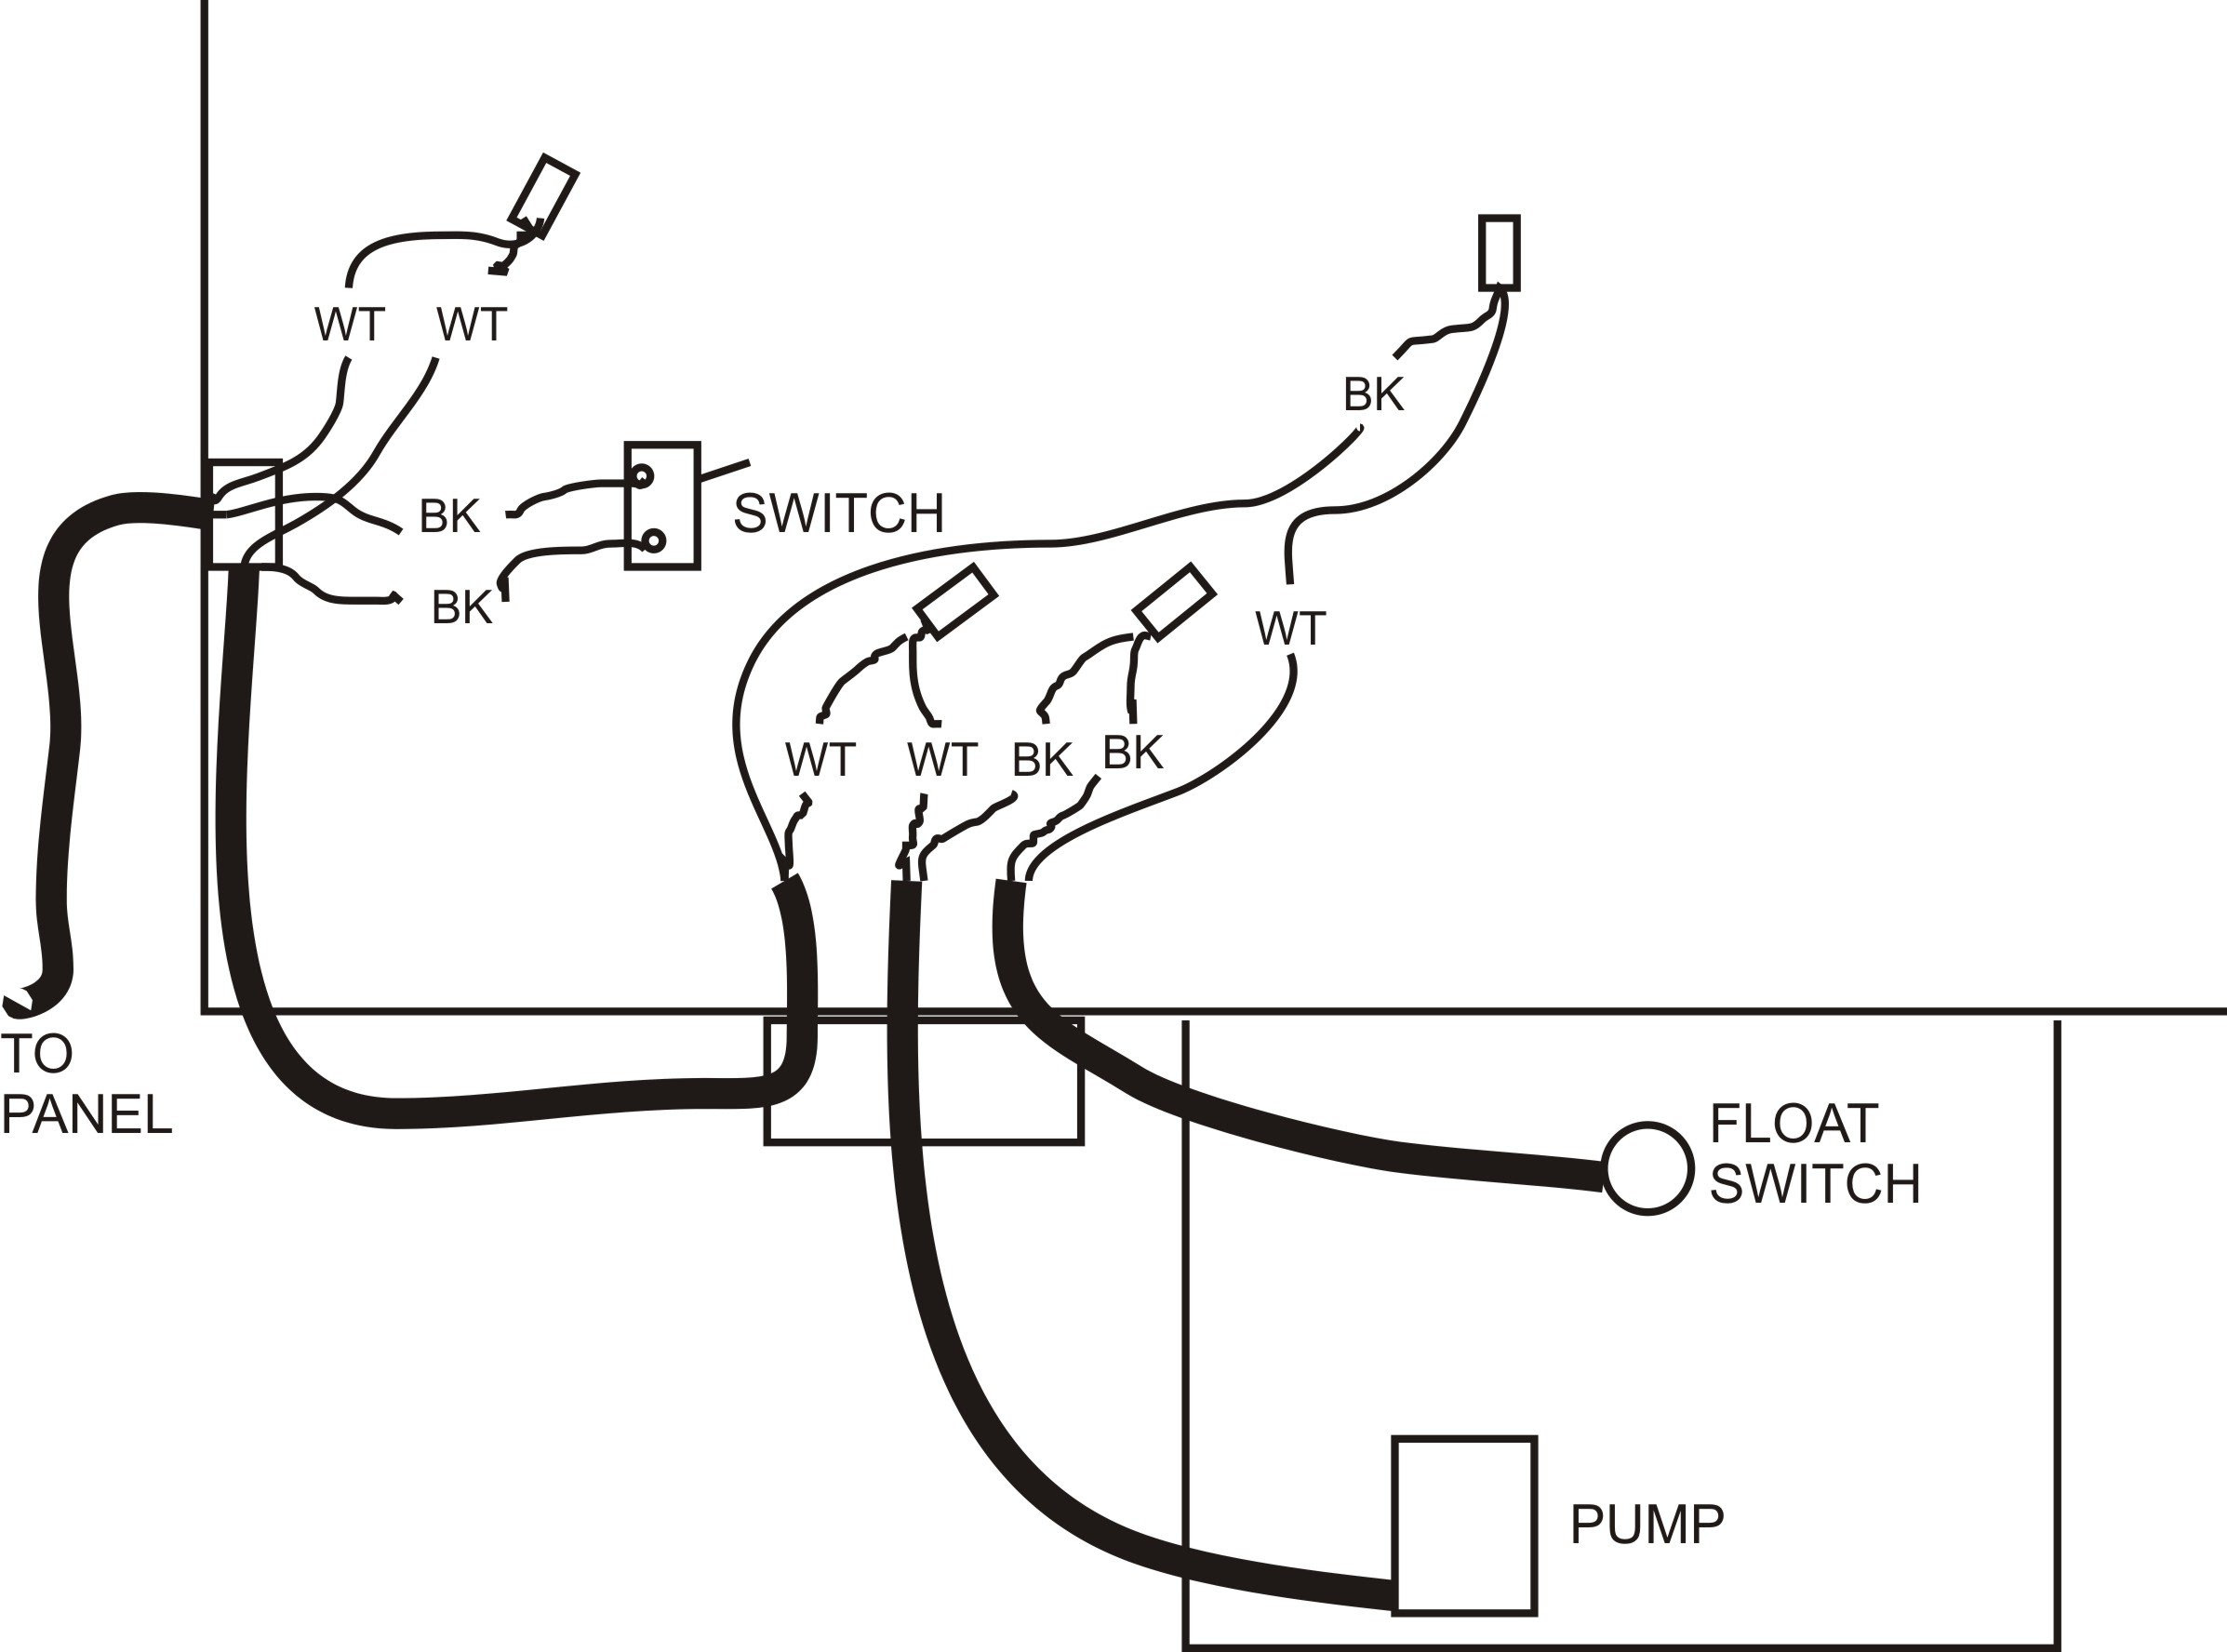 35 Septic Pump Wiring Diagram - Wiring Diagram List